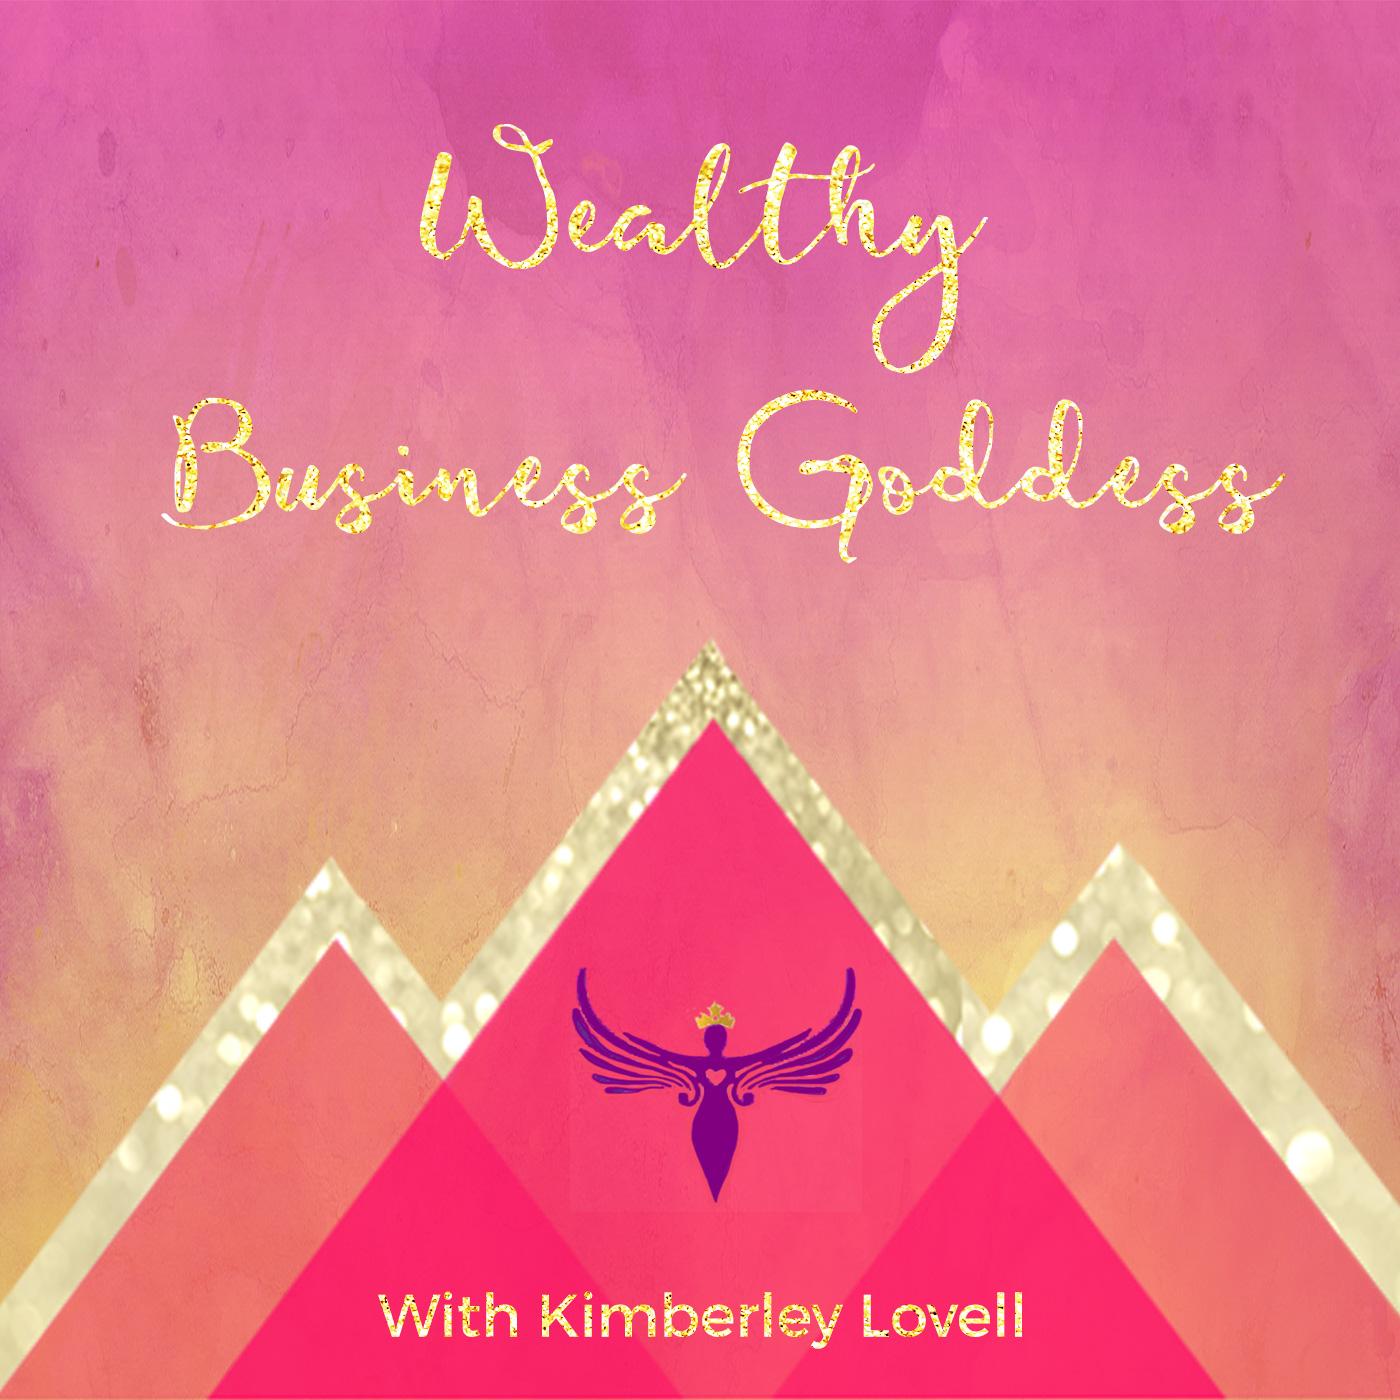 Wealthy Business Goddess Podcast  Dream Life Dream Business show art